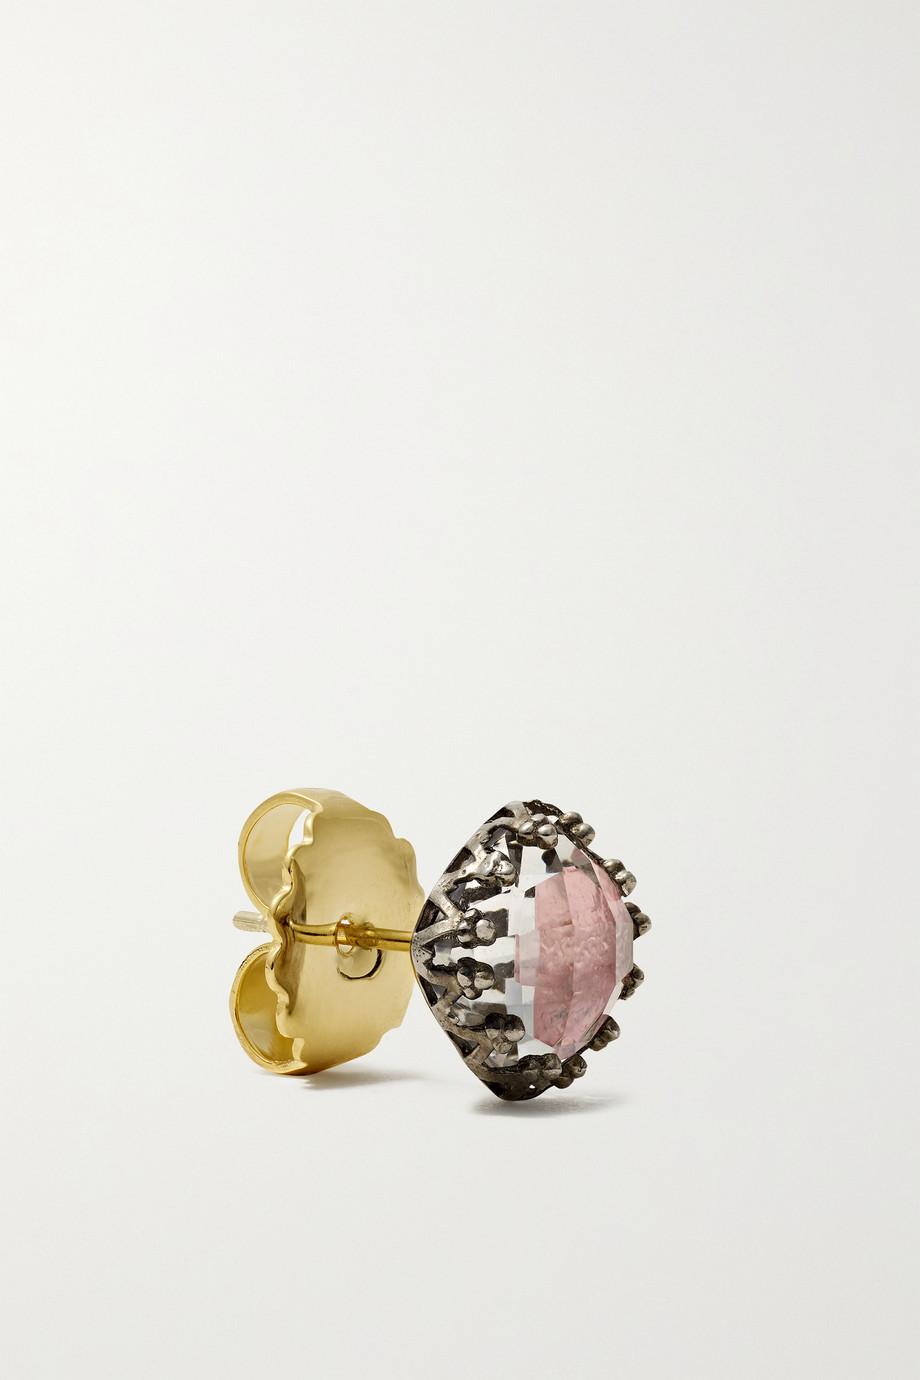 Larkspur & Hawk Jane rhodium-dipped quartz earrings